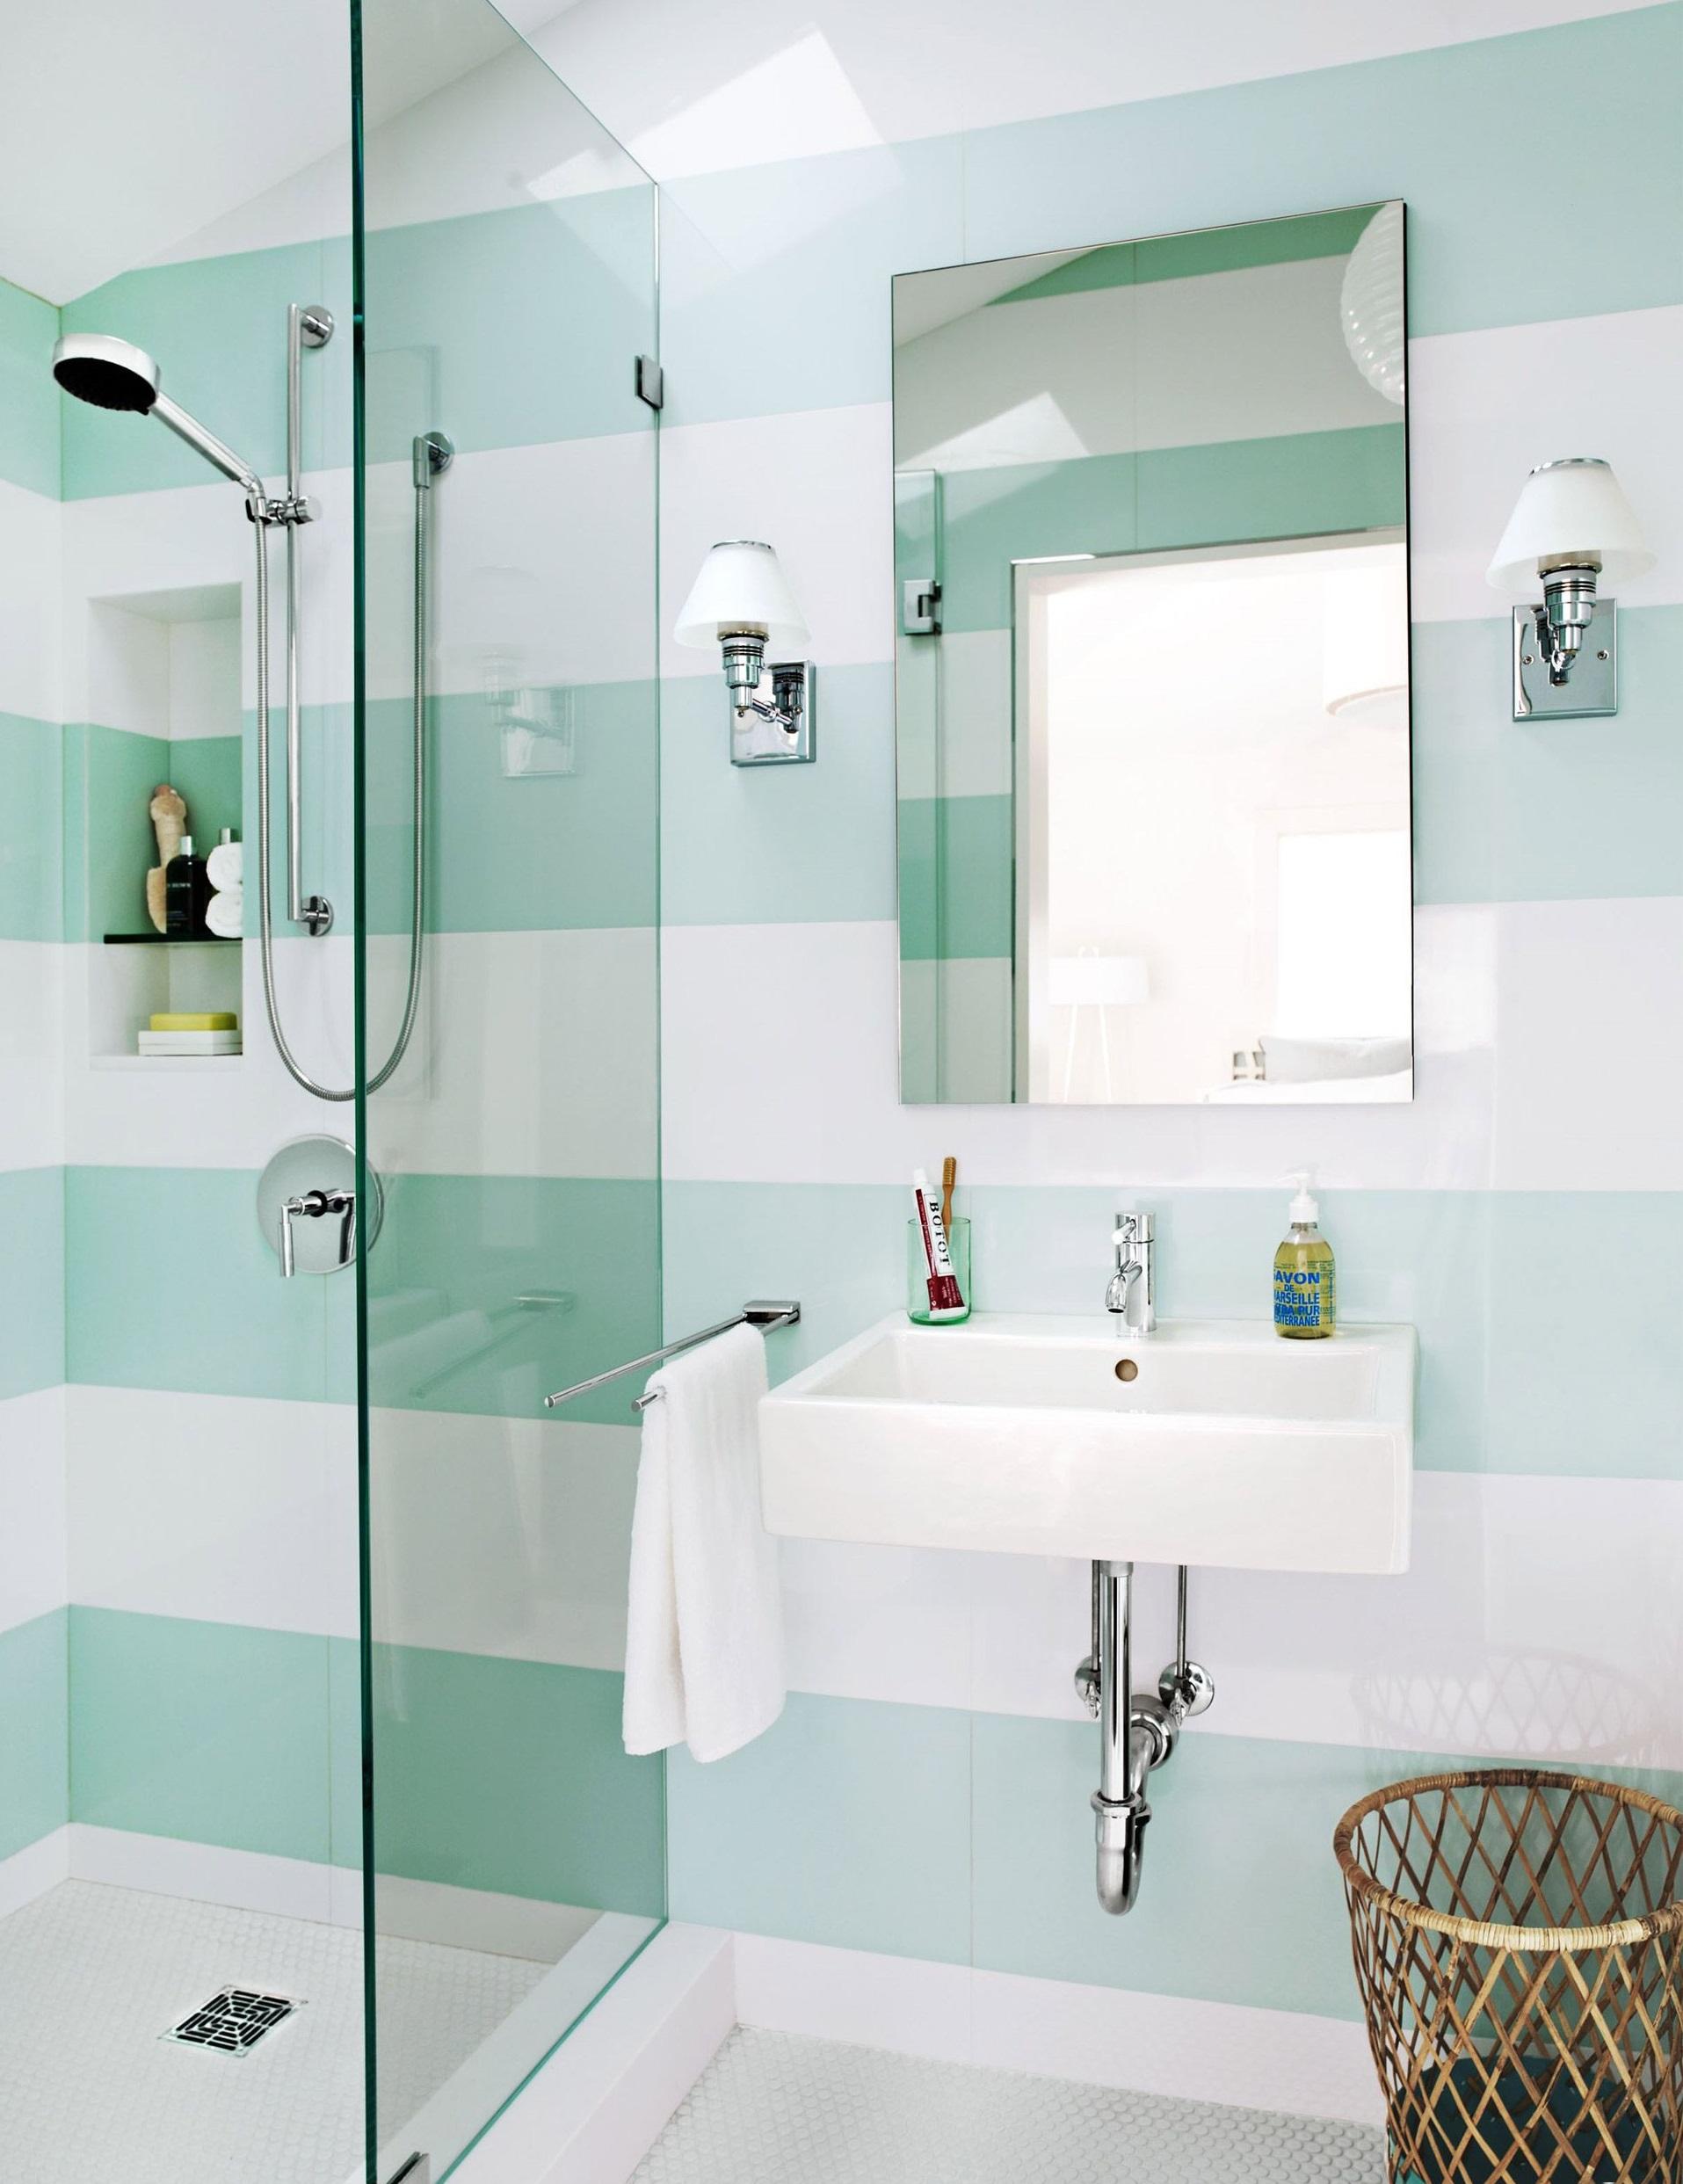 Покраска ванной комнаты своими руками фото 794